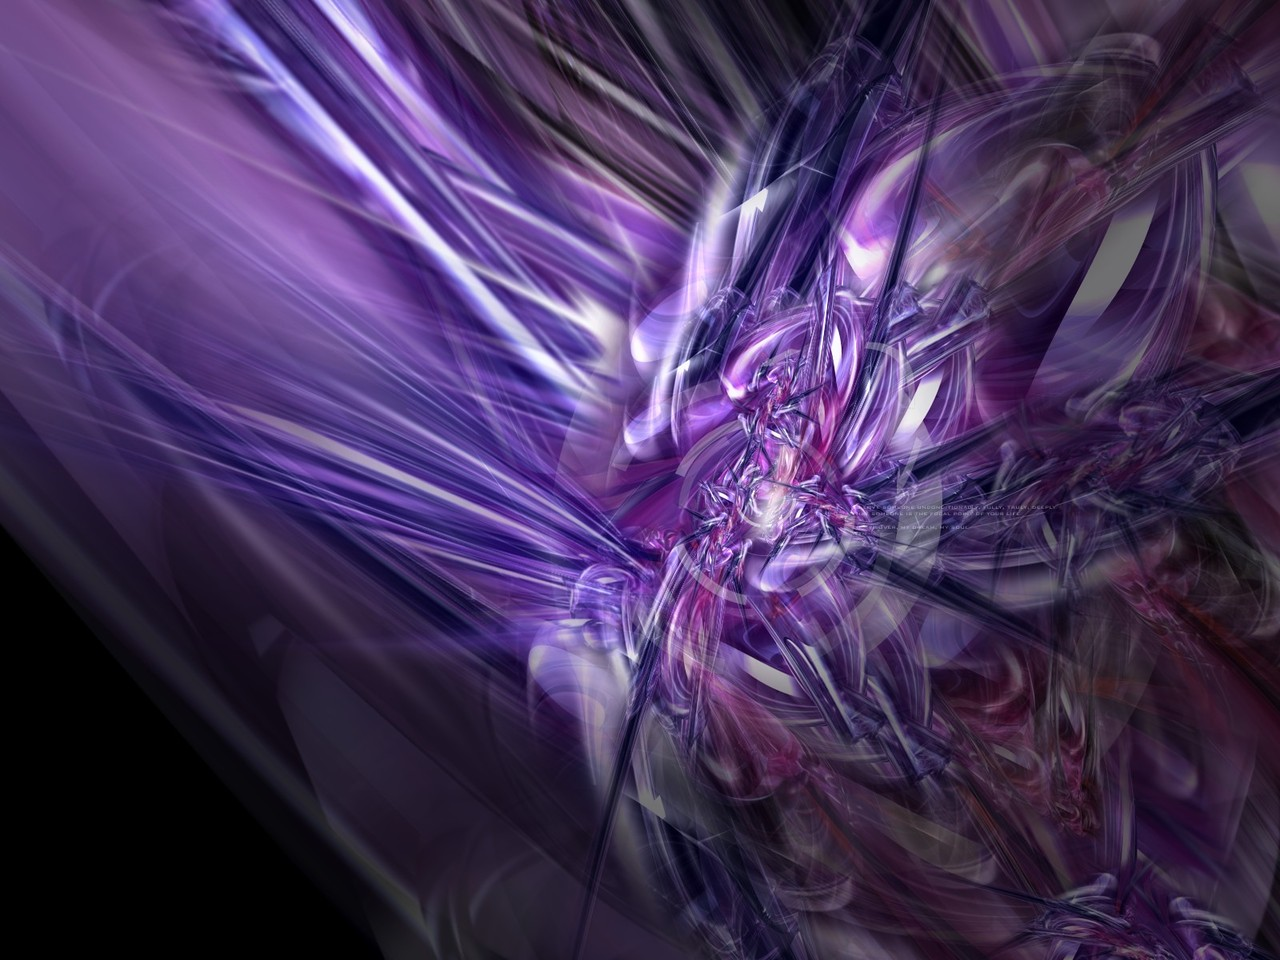 Cool Purple Background